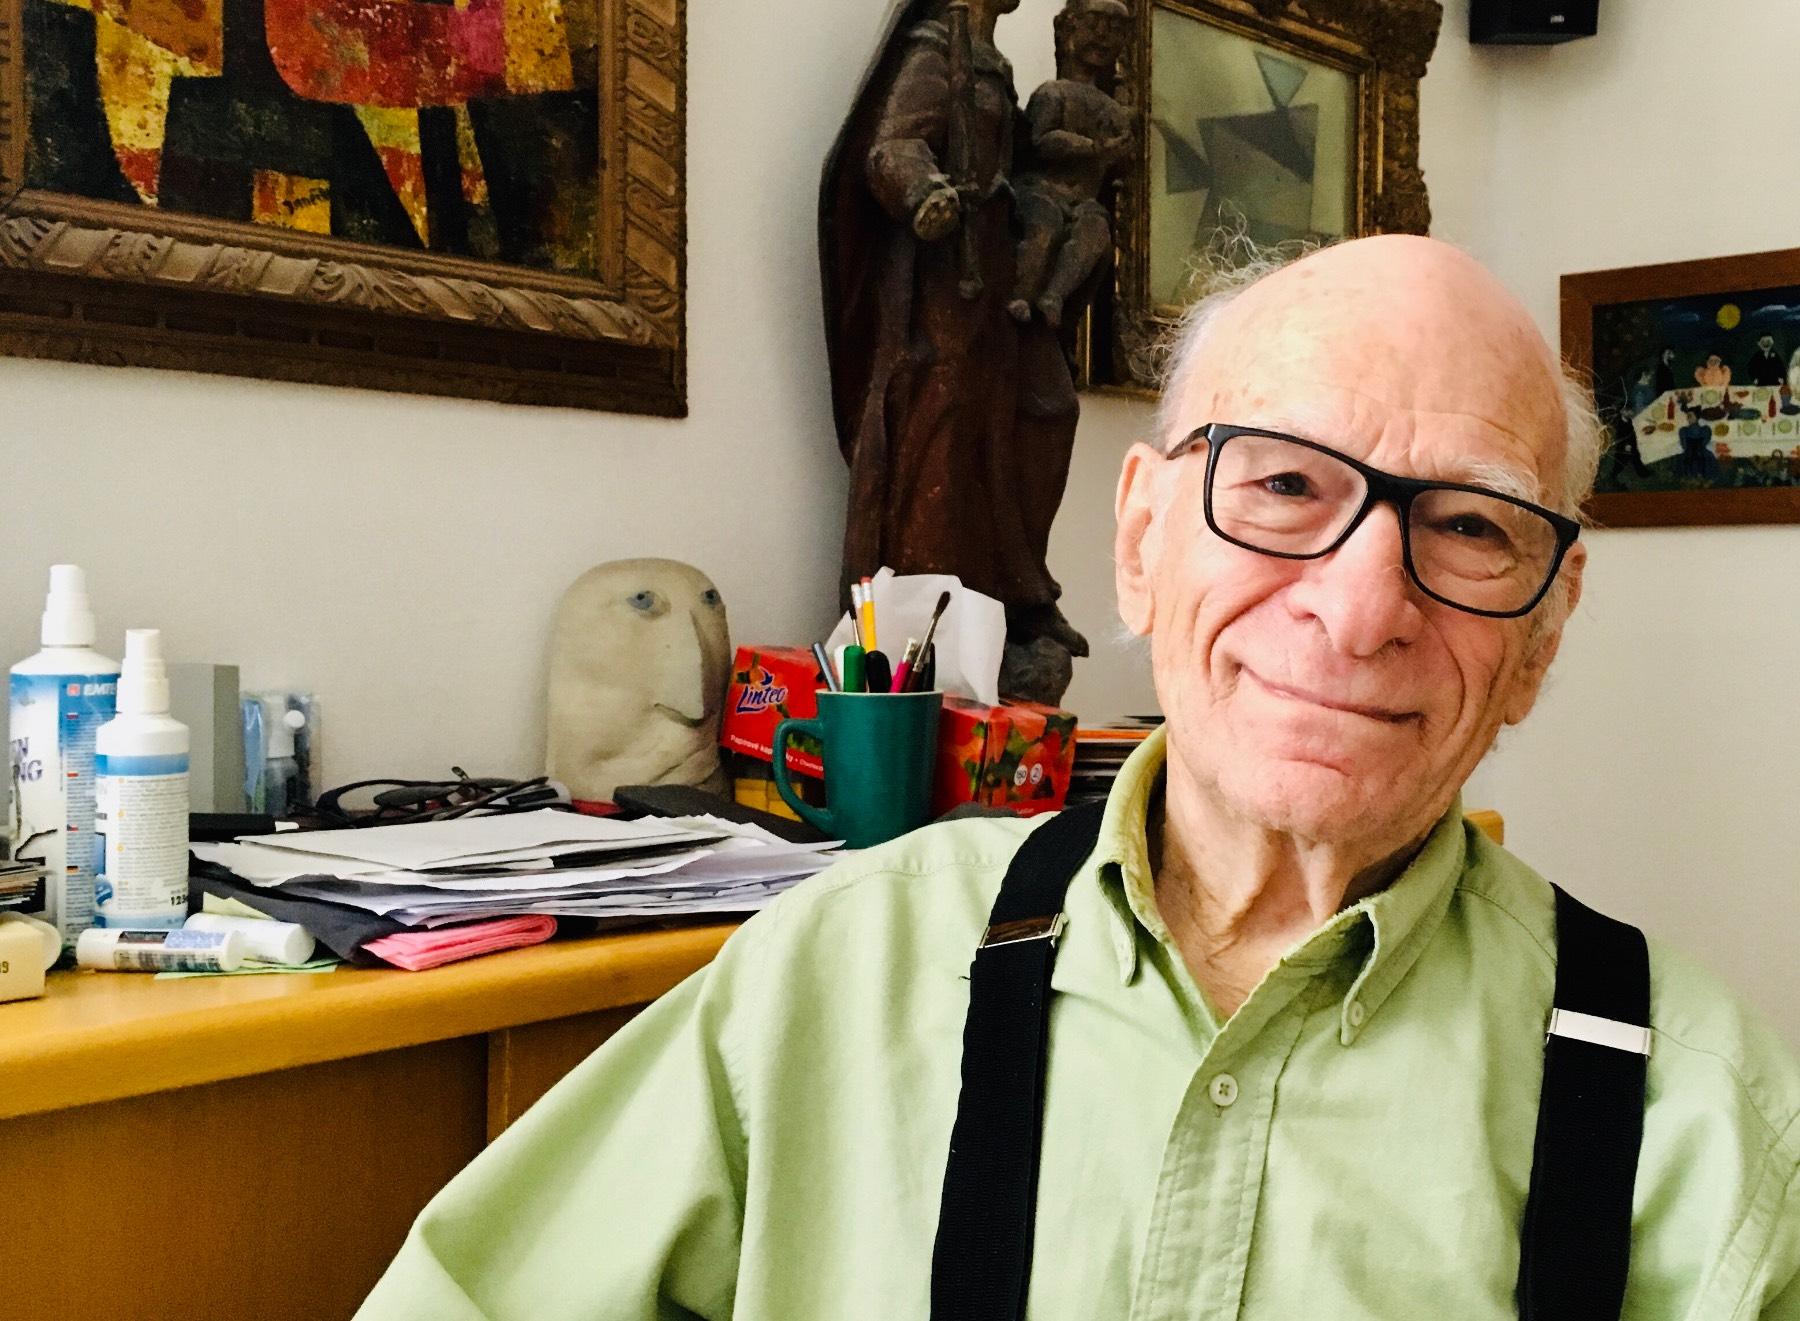 Gene Deitch, Part 1: The Oscar-winning US animator who made Tom and Jerry cartoons in communist Prague | Radio Prague